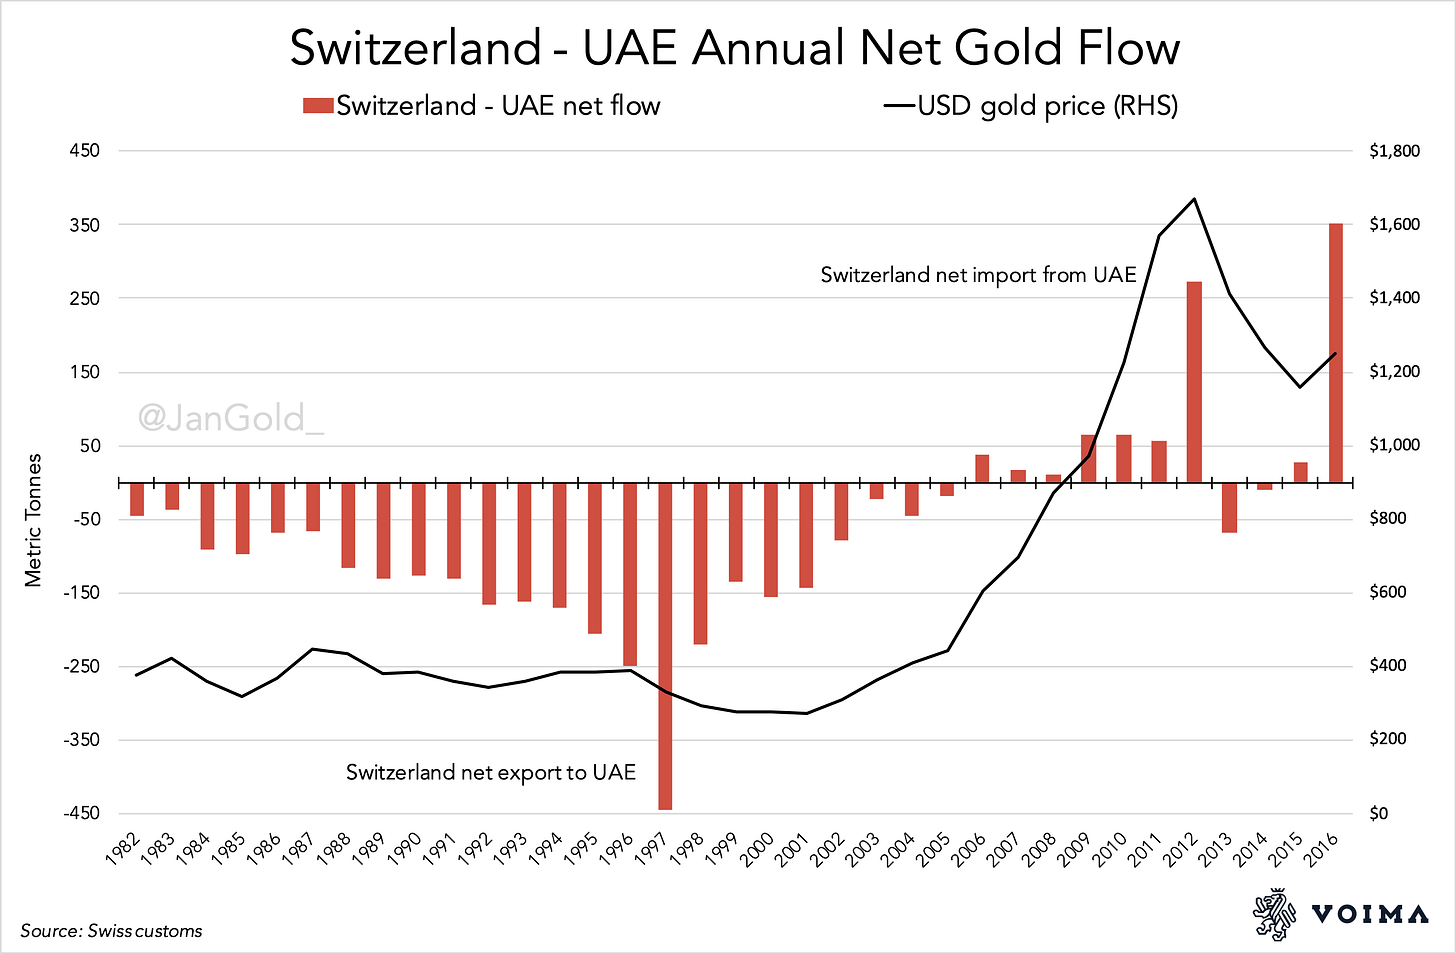 Swizteralnd UAE gold 1982 - 2016